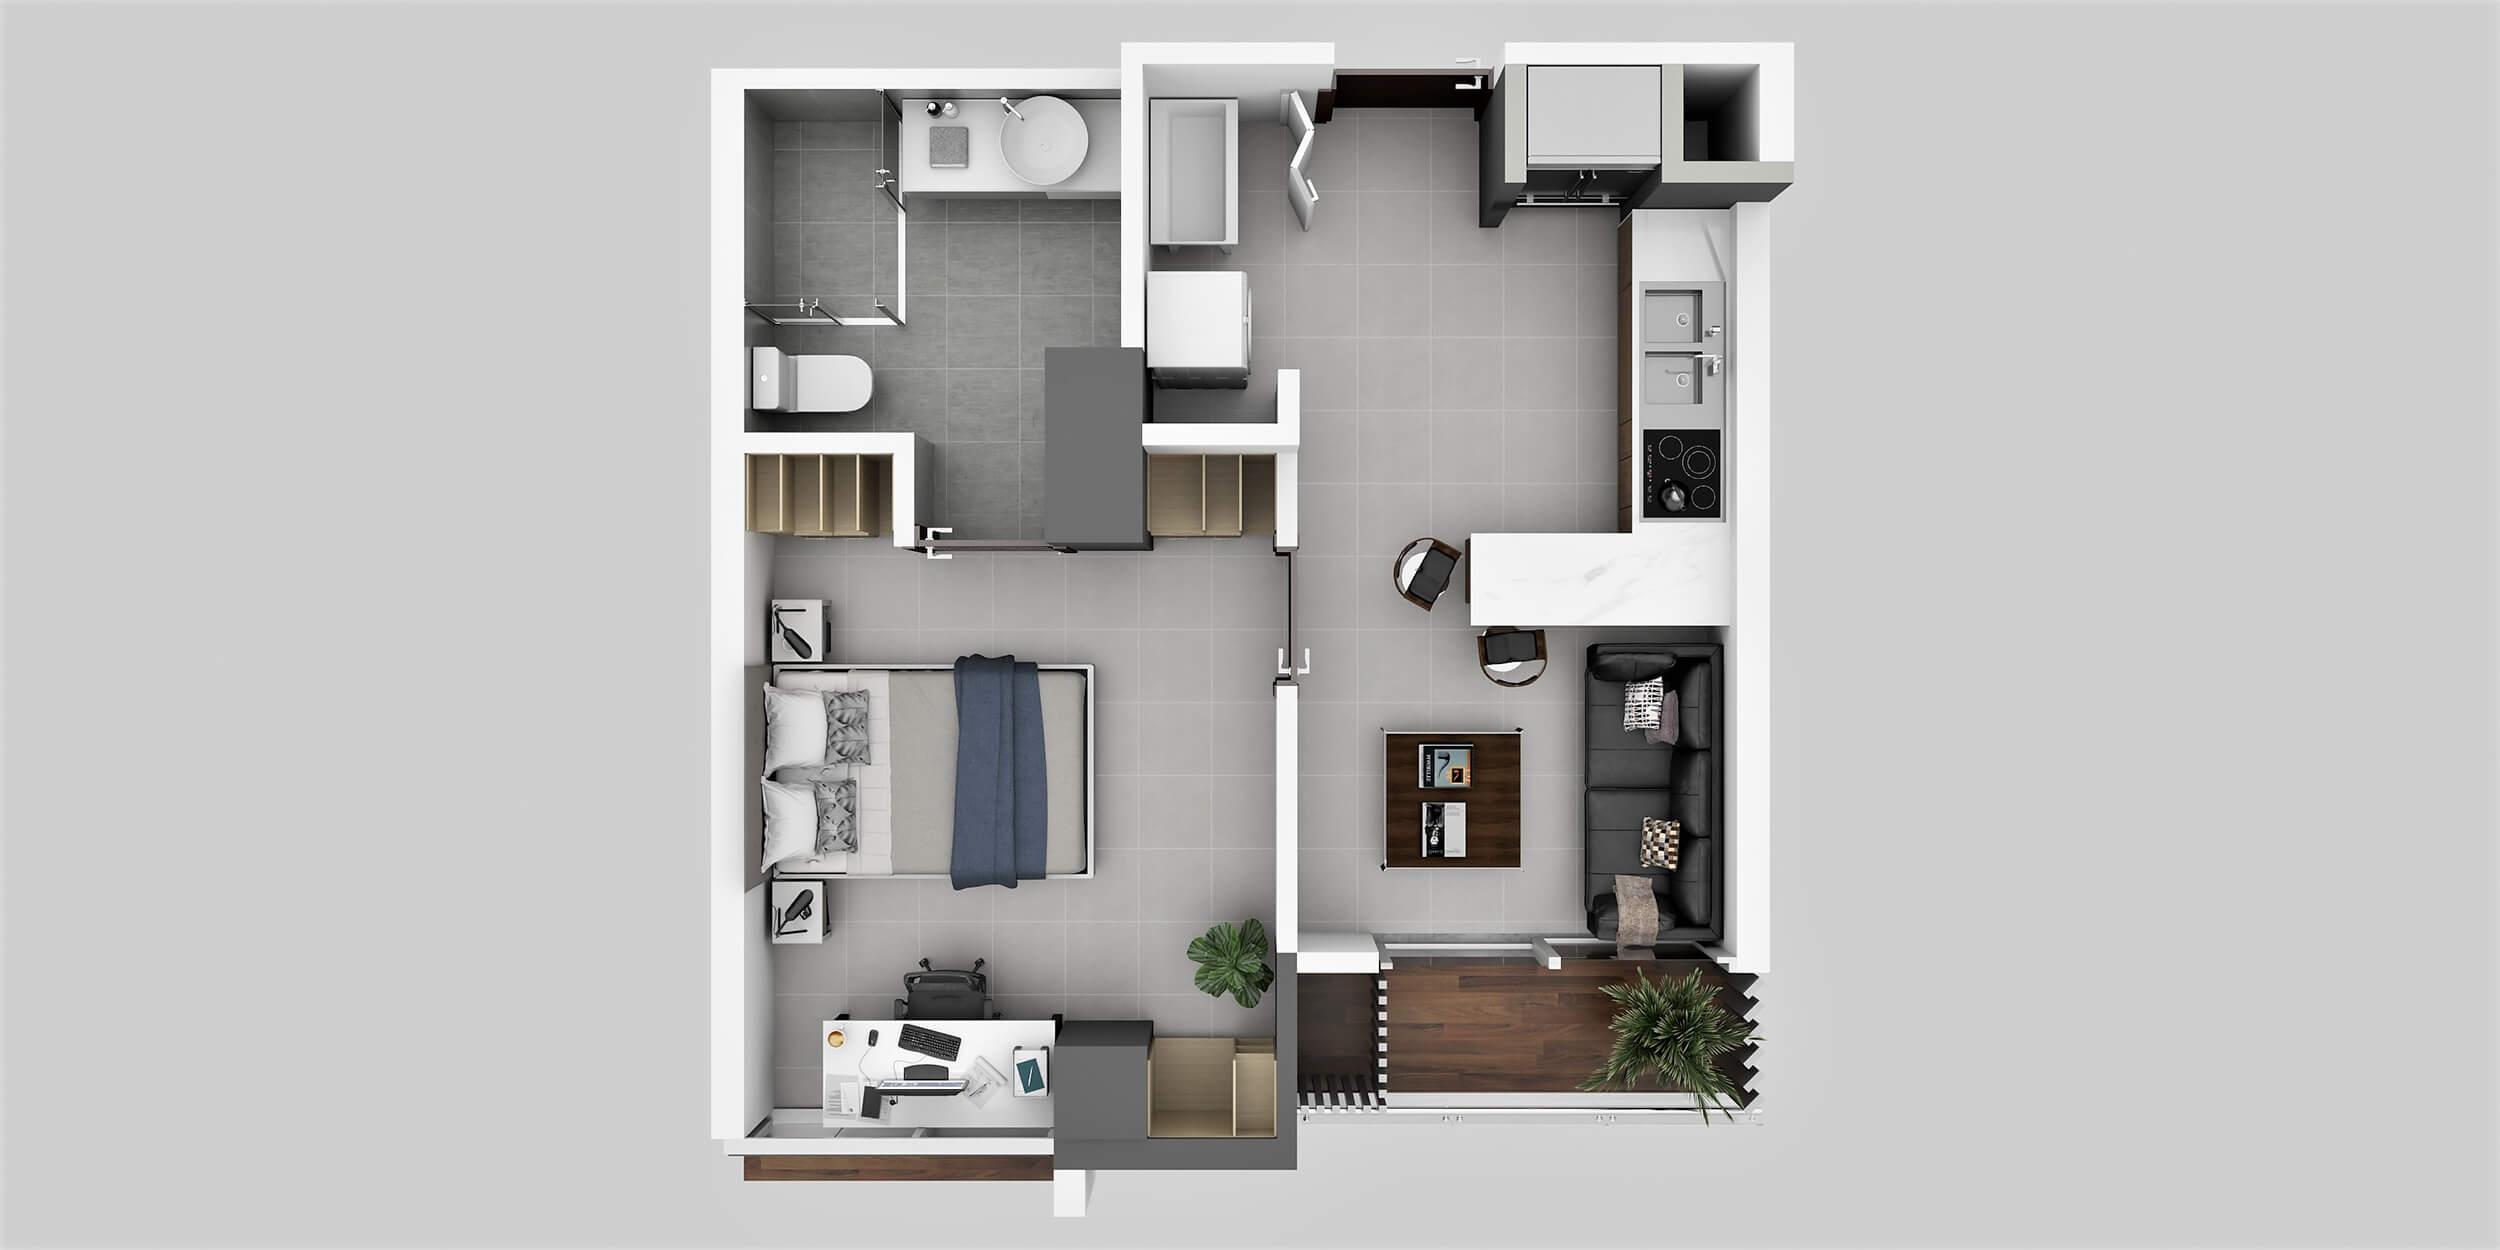 Apartamento Tipo 6A1 Habitación